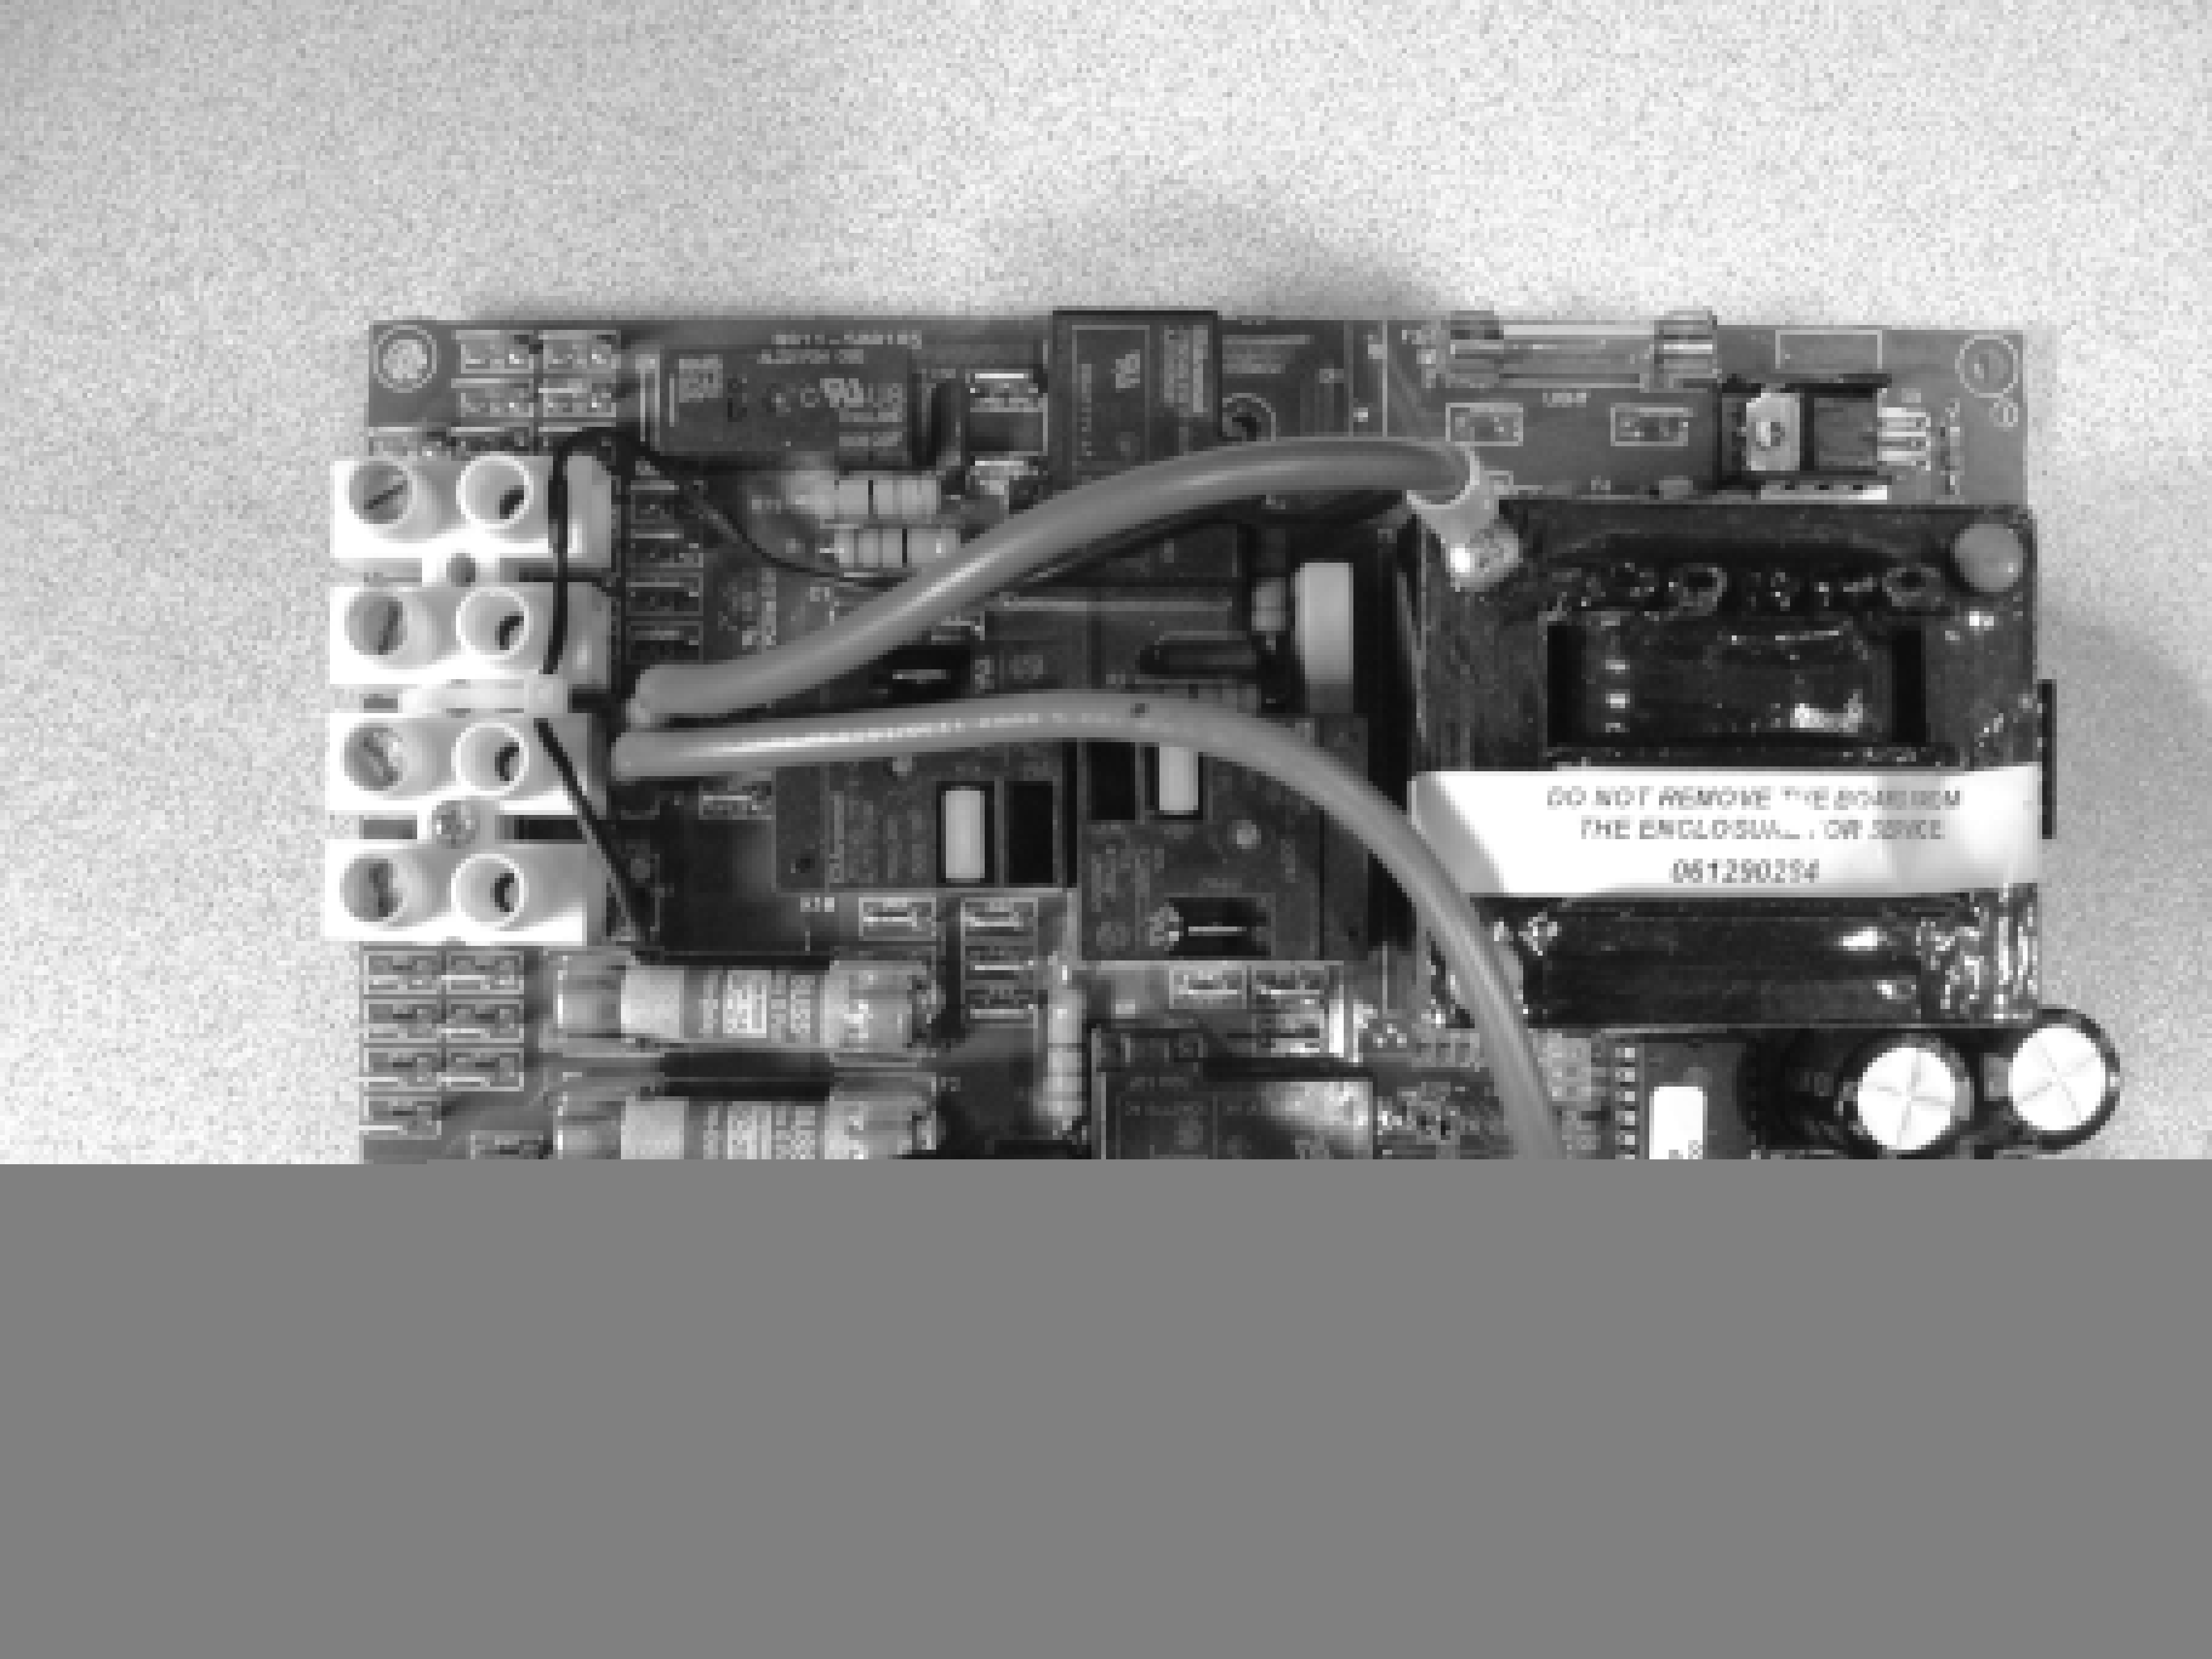 Groovy Led Display Board Circuit Diagram Http Wwwseekiccom Circuit Wiring Cloud Vieworaidewilluminateatxorg